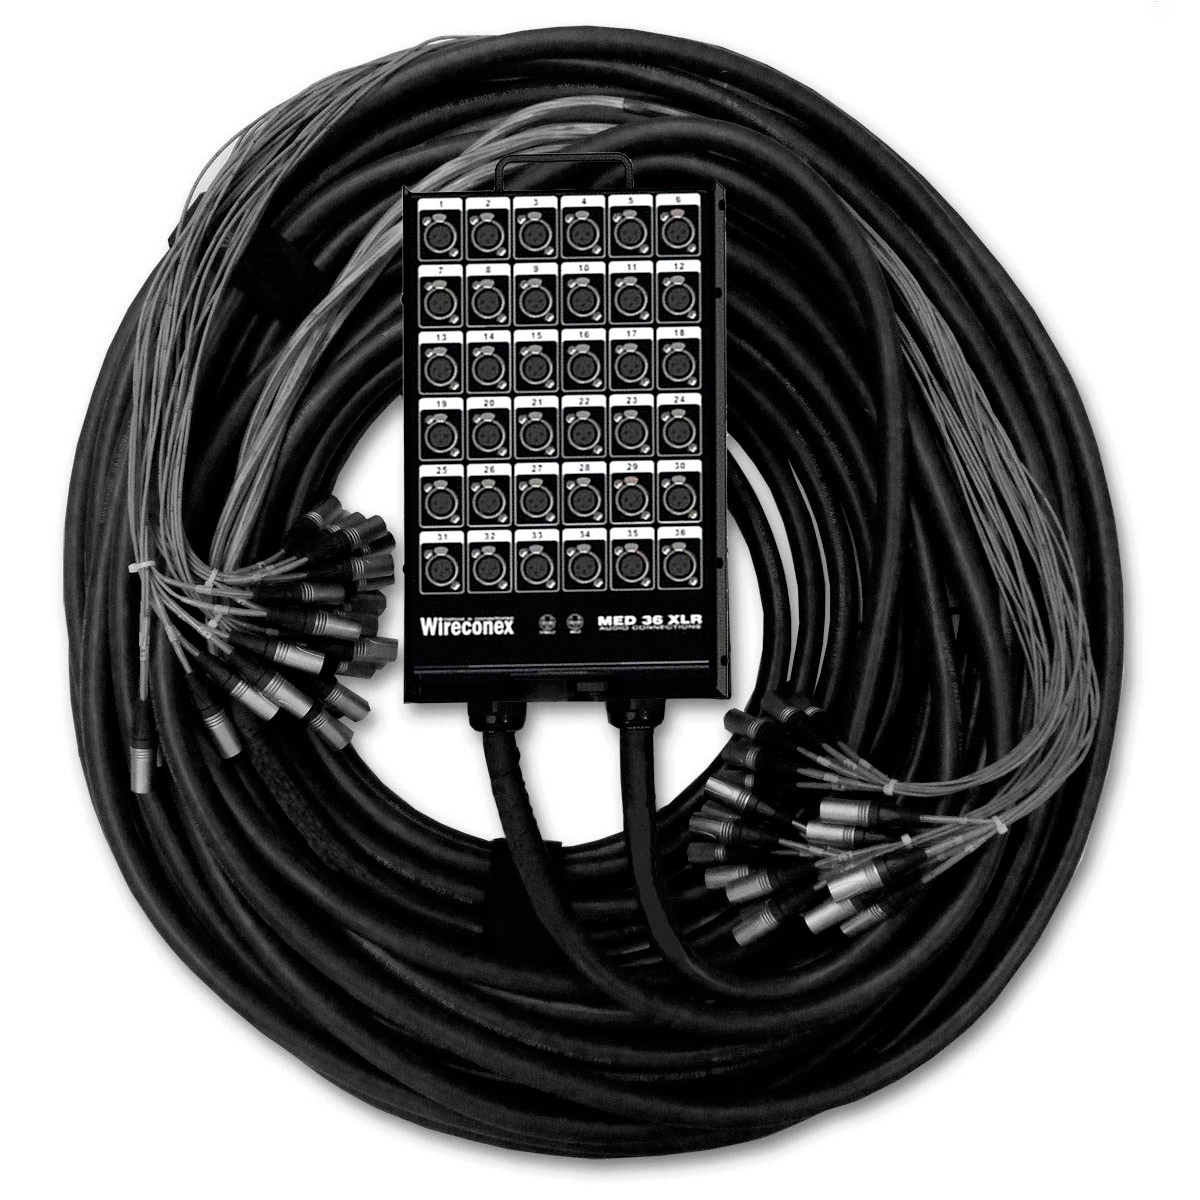 Multicabo Spliter 36 Vias XLR c/ Trava 40mts x 10mts - VR CABOS